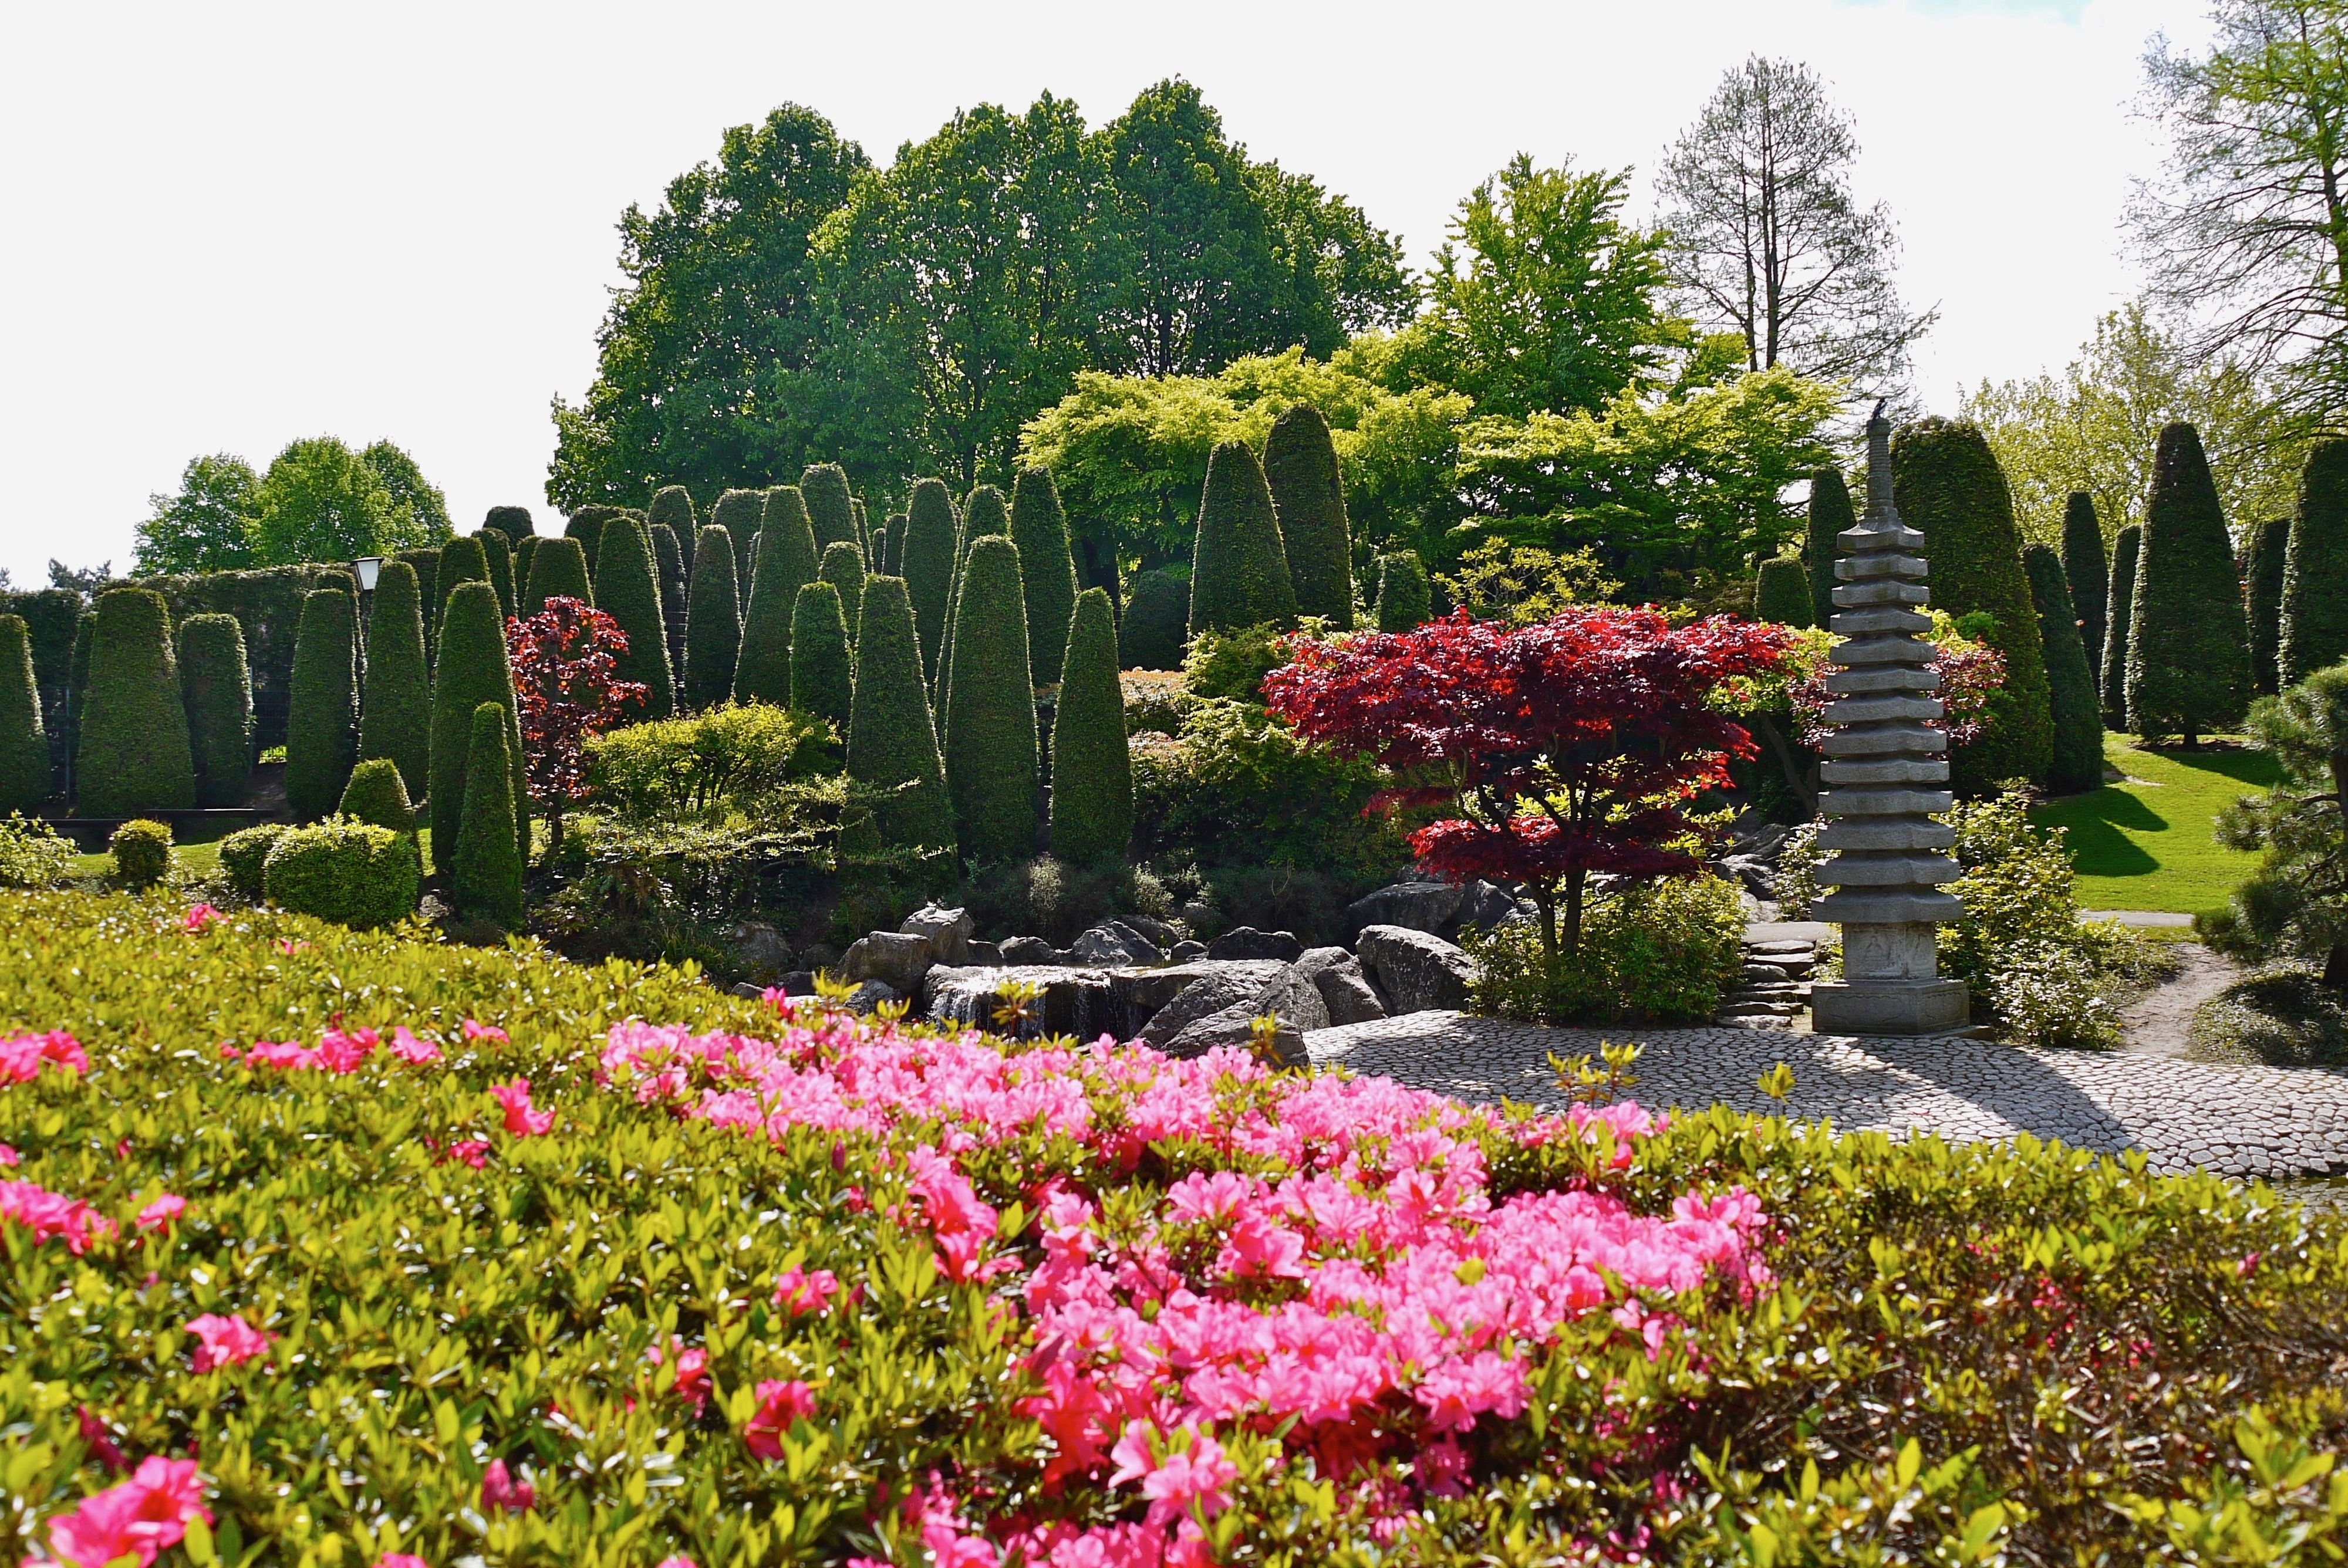 Japanischer Garten In Bonn Bonn Reiseziele Italien Botanischer Garten